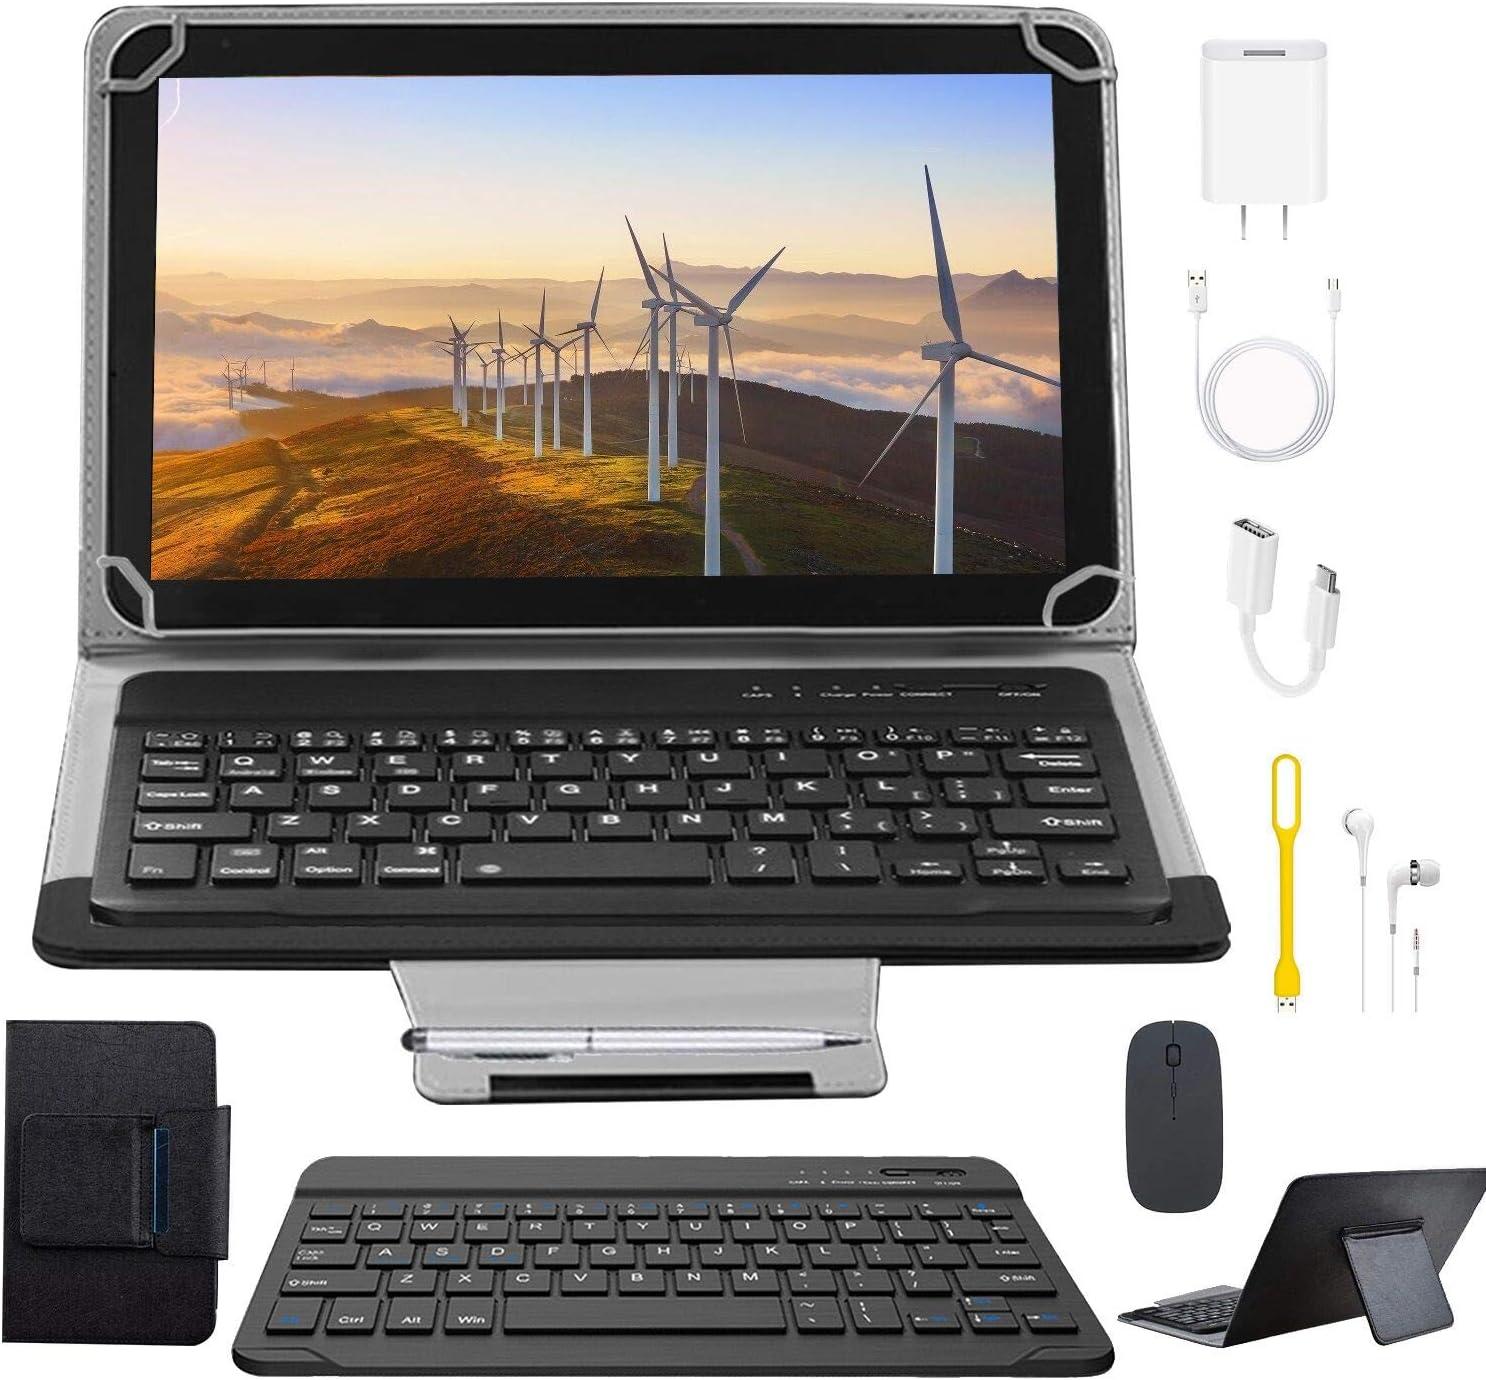 Tablets 10.1 Pulgadas Full HD, Android 9.0 WiFi/4G/OTG, 4GB RAM + 64GB ROM, Quad-Core 8MP Cámara Tablet PC 8000mAh Batería Moviles Buenos o Tablets Puede Llamar Apoyo Dual SIM (Black)